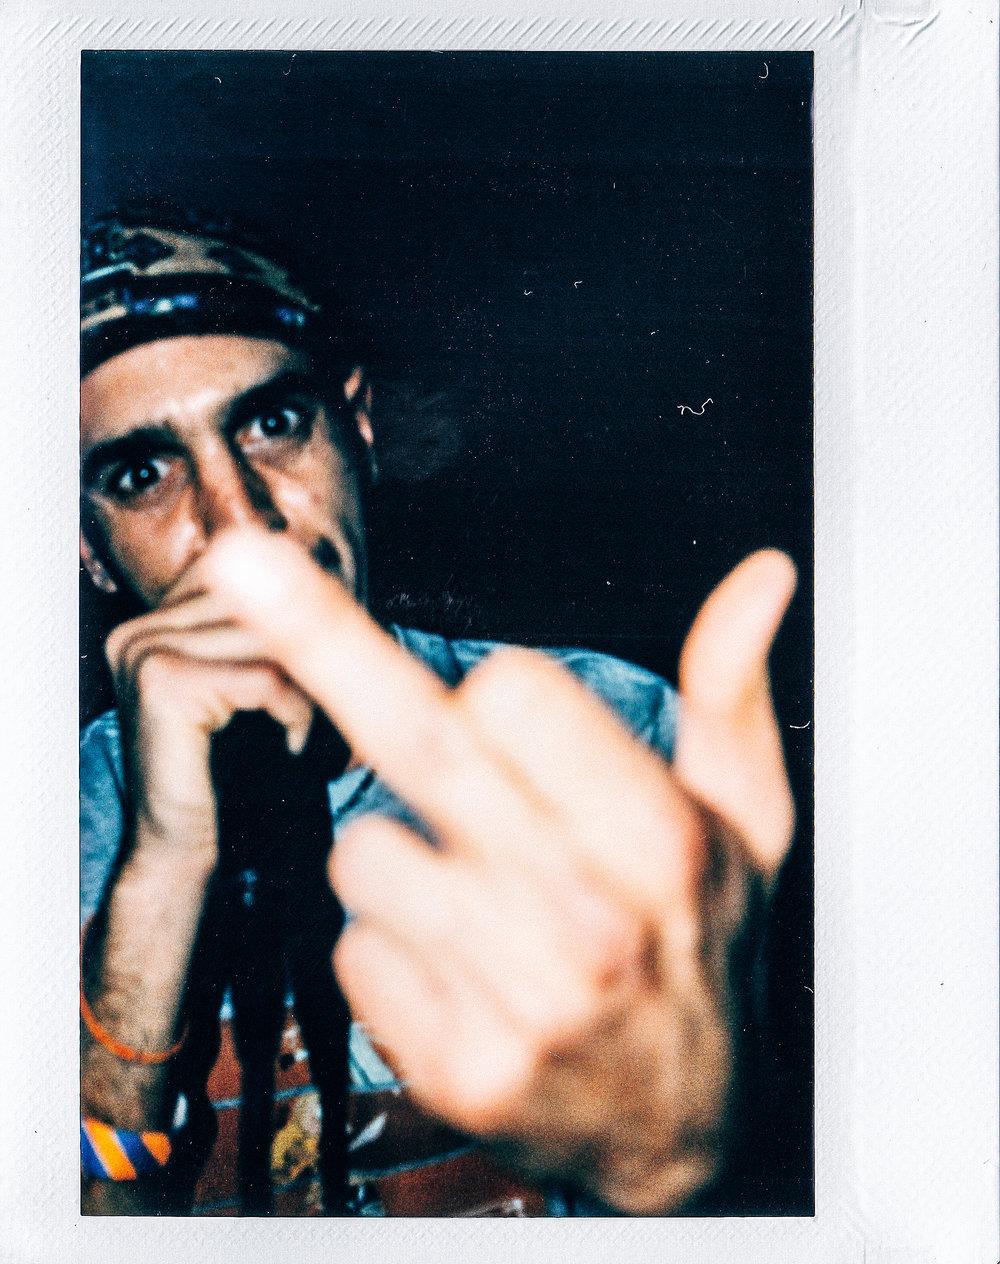 Jam_Baxter_Touching_Scenes_Polaroids-14.jpg